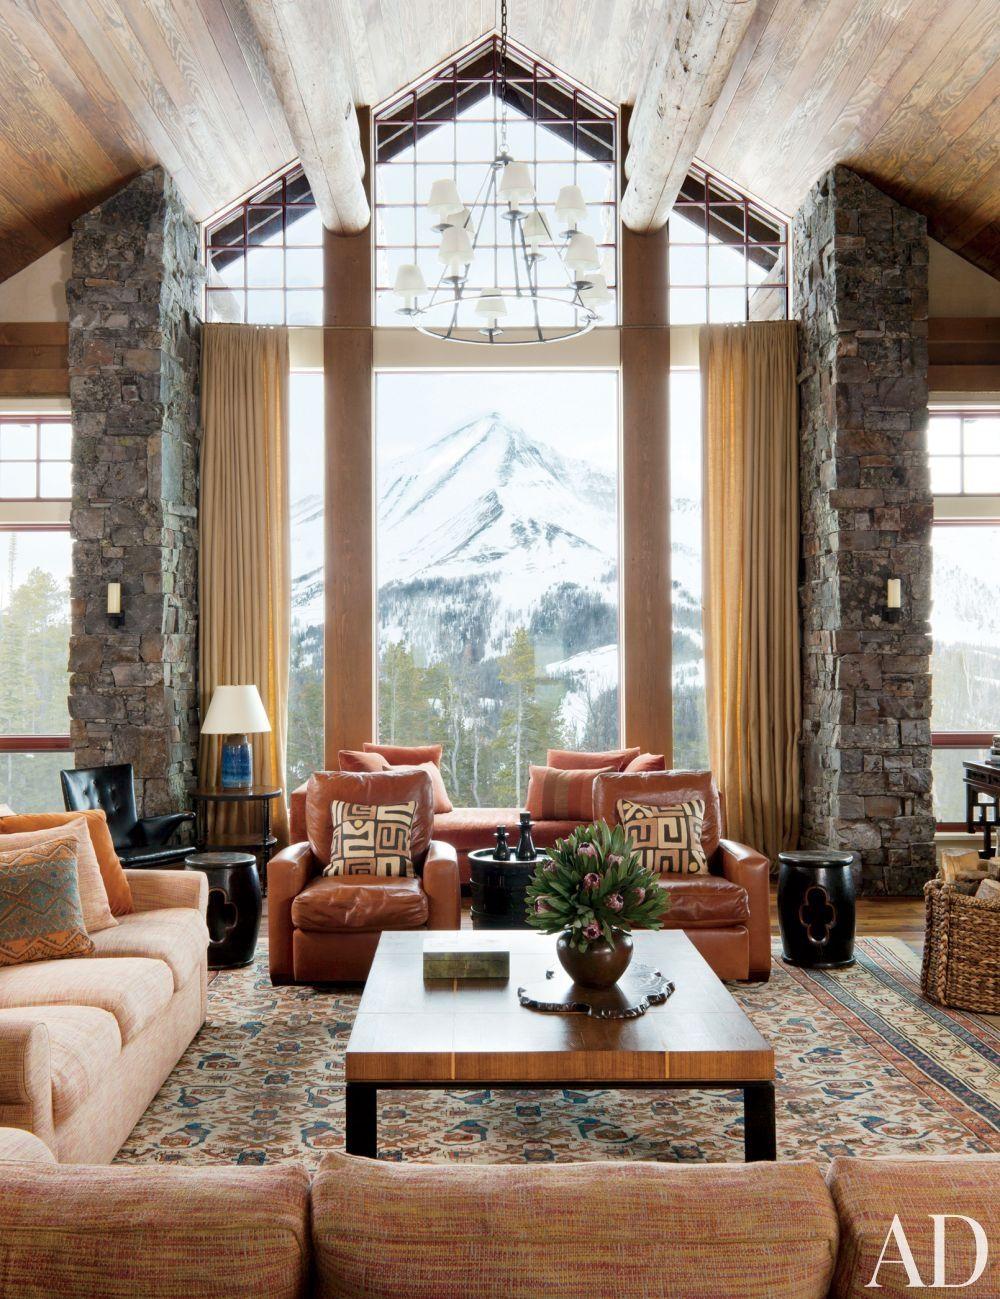 Center Stage Via Archdigest Designfile Living Room Decor